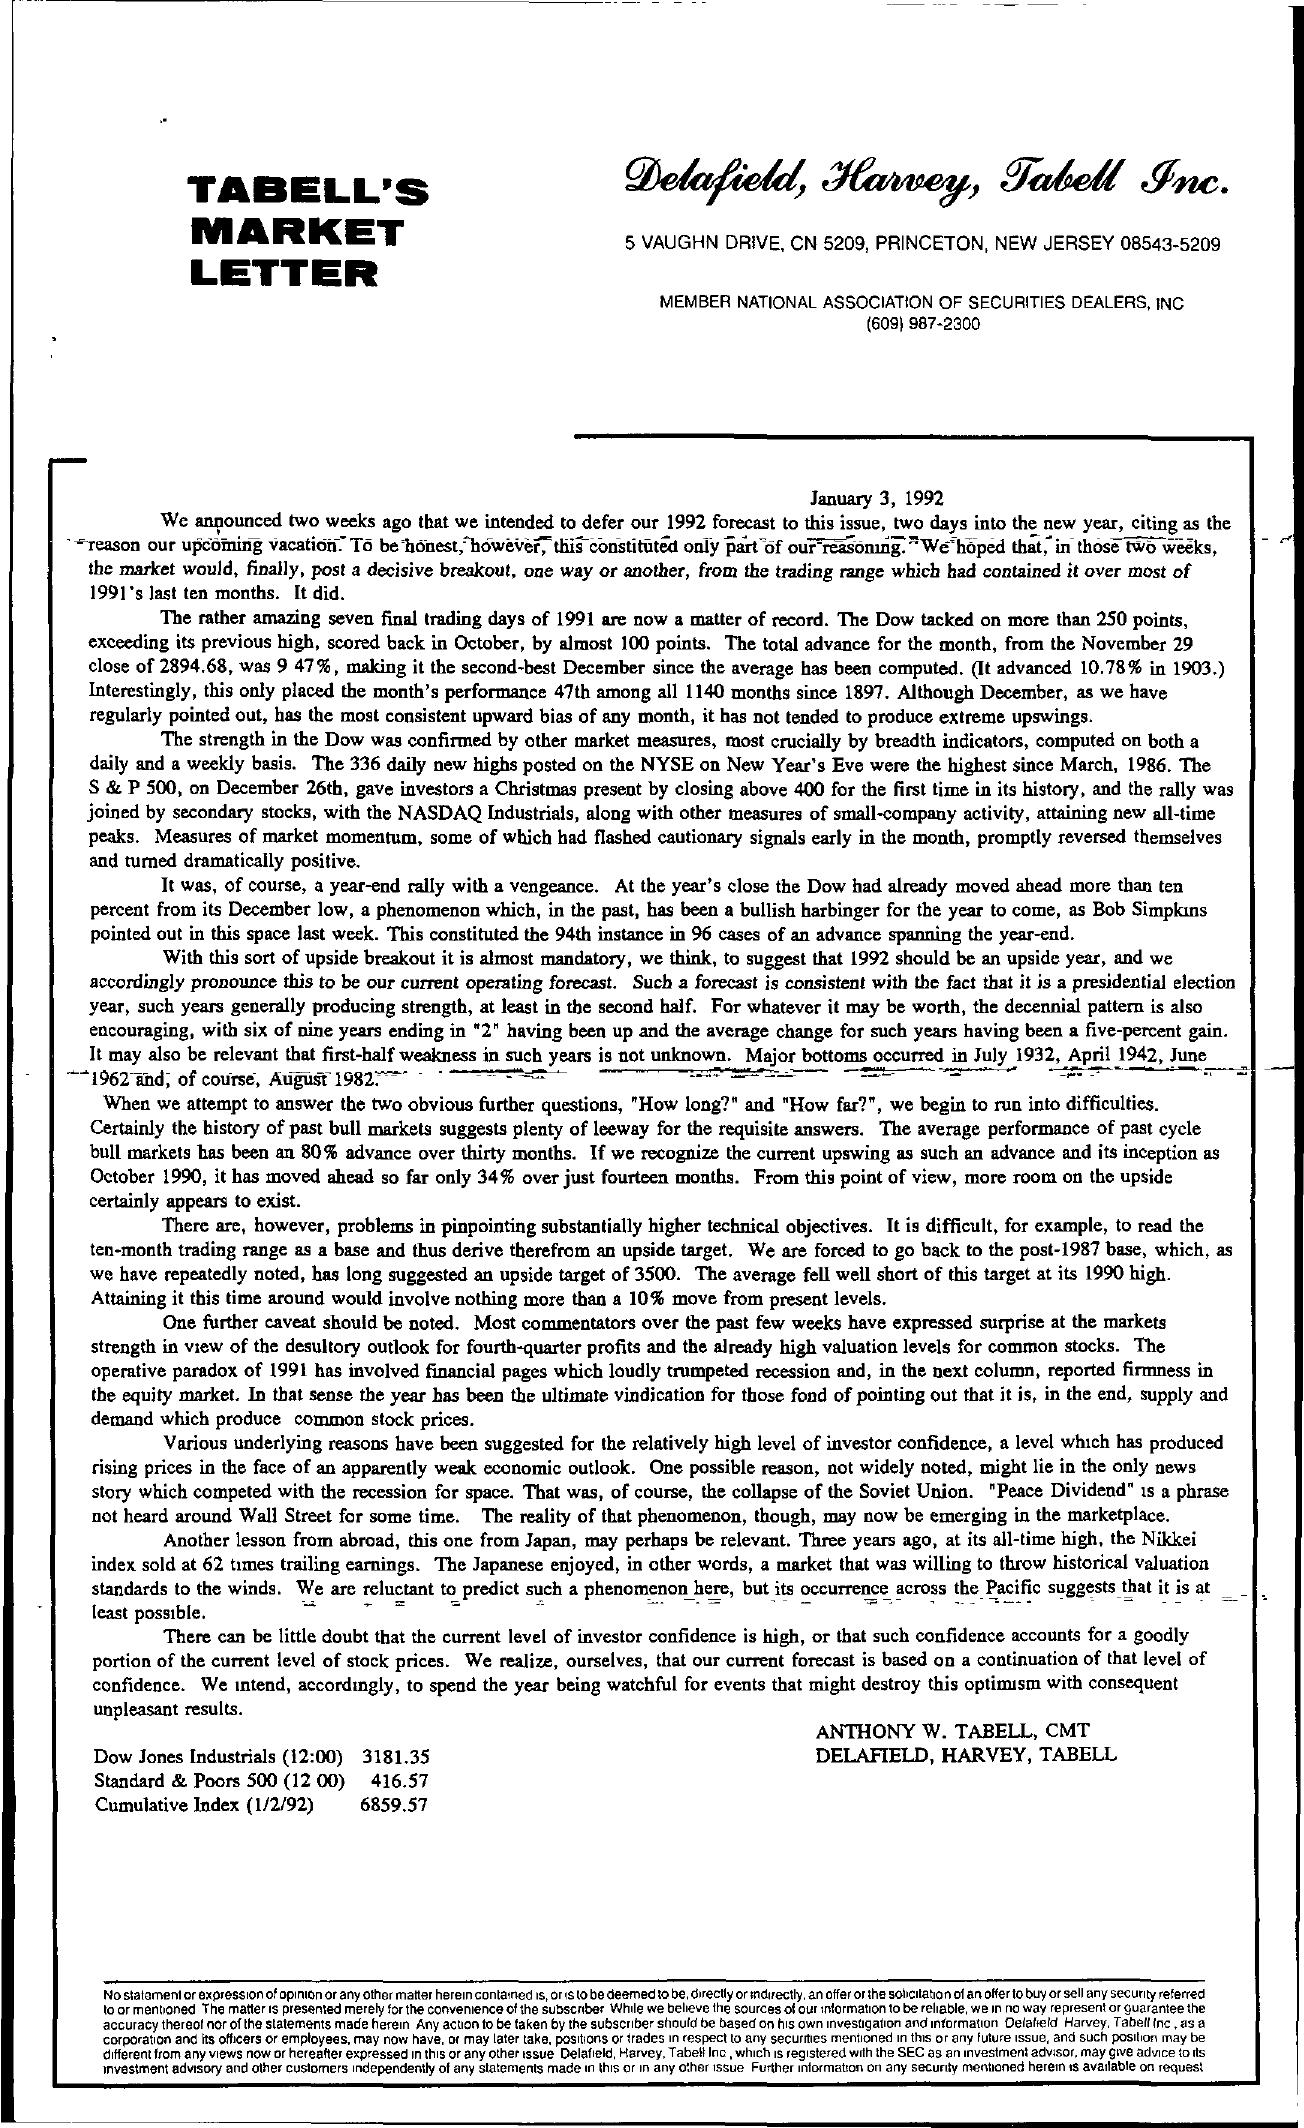 Tabell's Market Letter - January 03, 1992